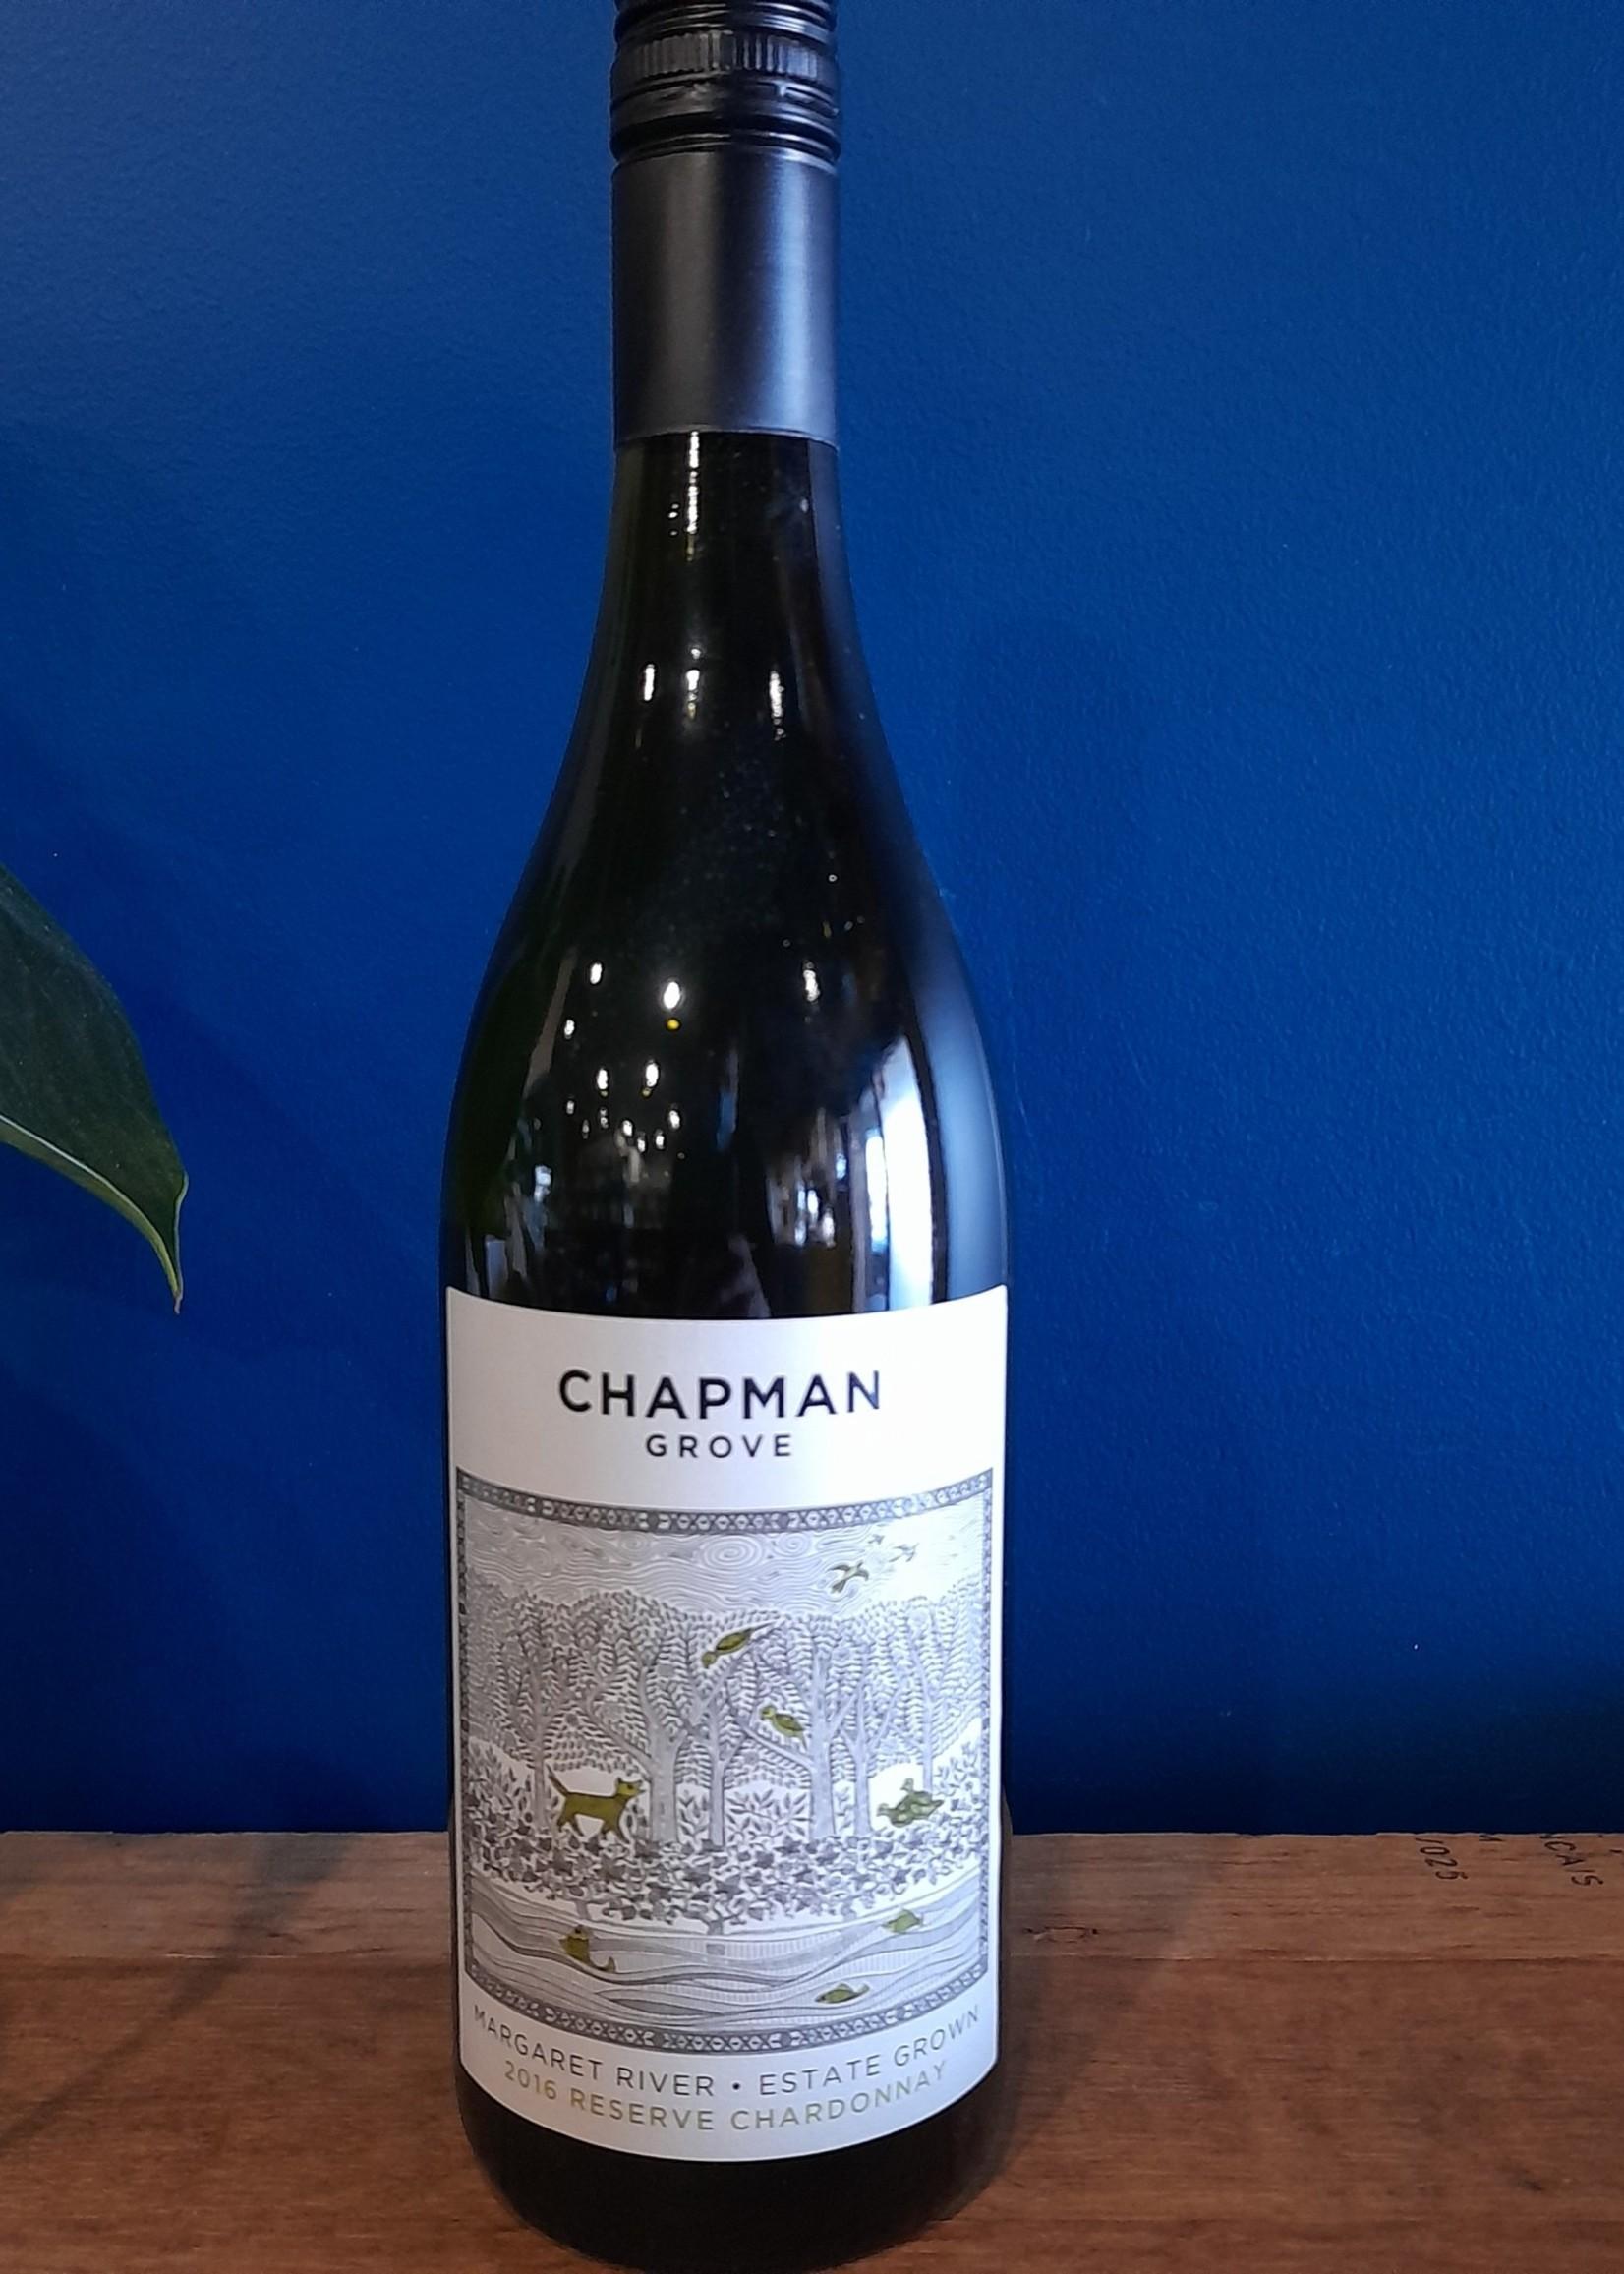 Chapman Grove Chapman Grove 2016 Reserve Chardonnay